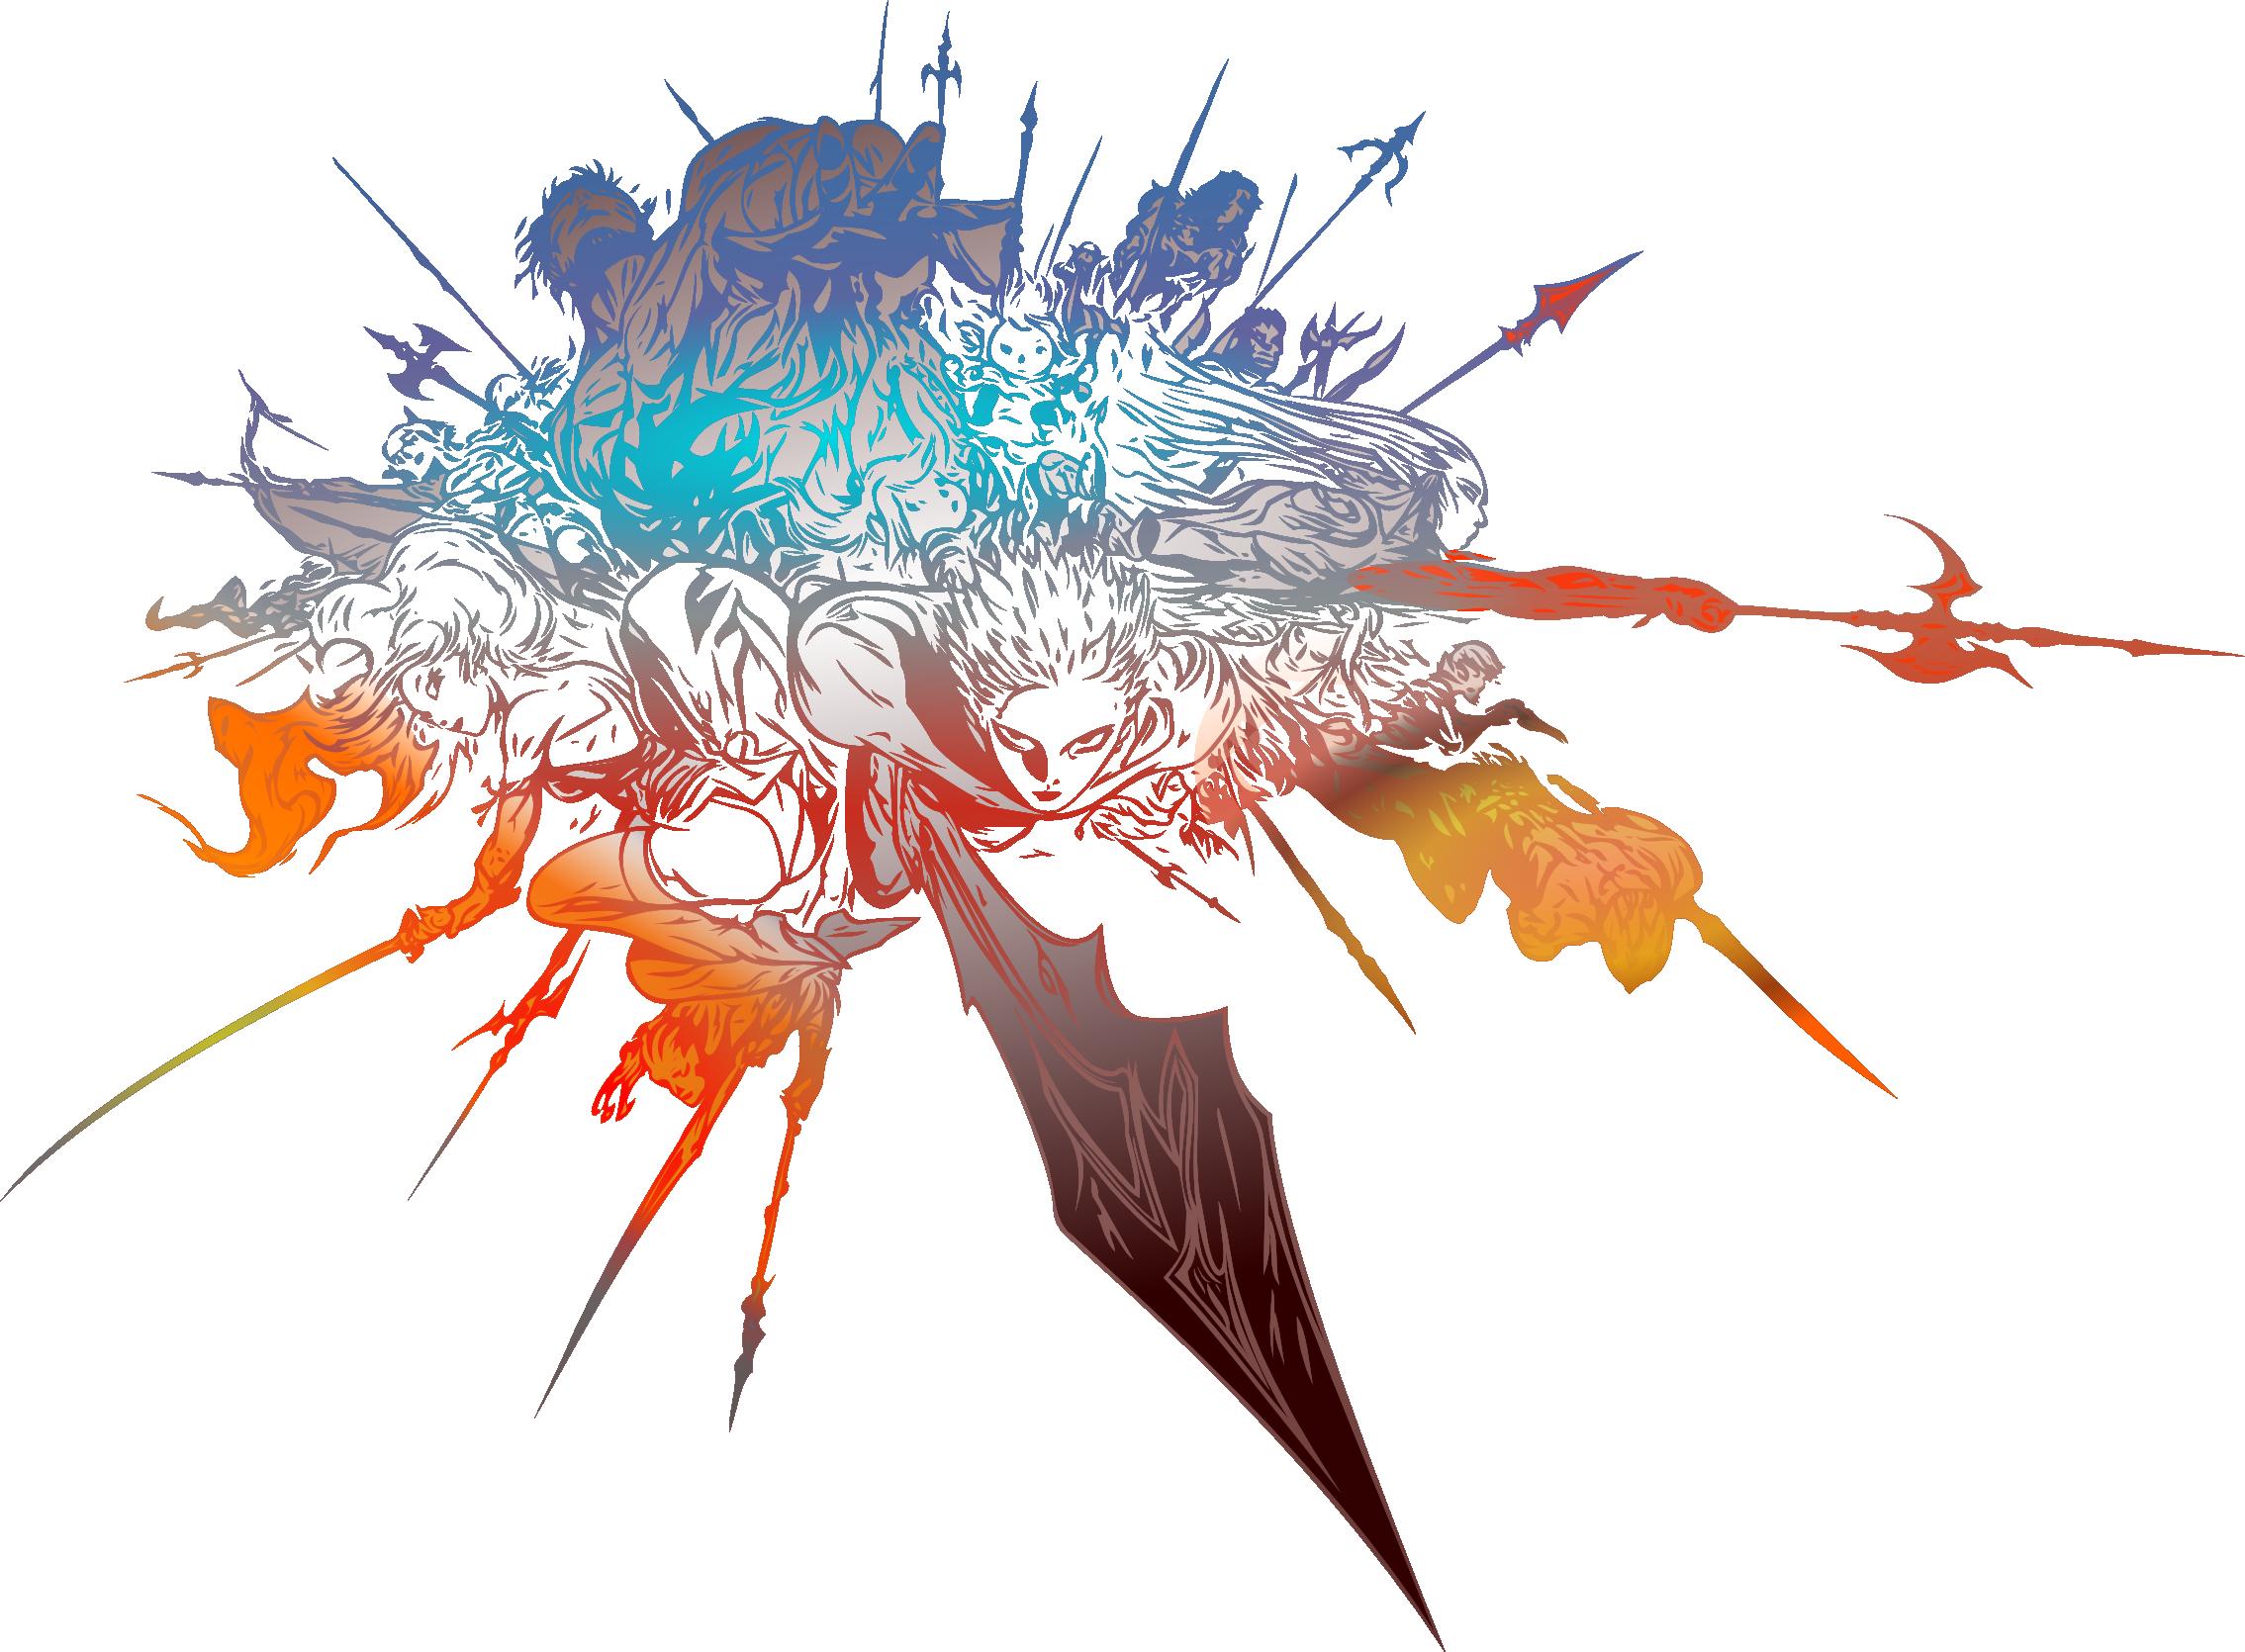 Final fantasy logo art - photo#14